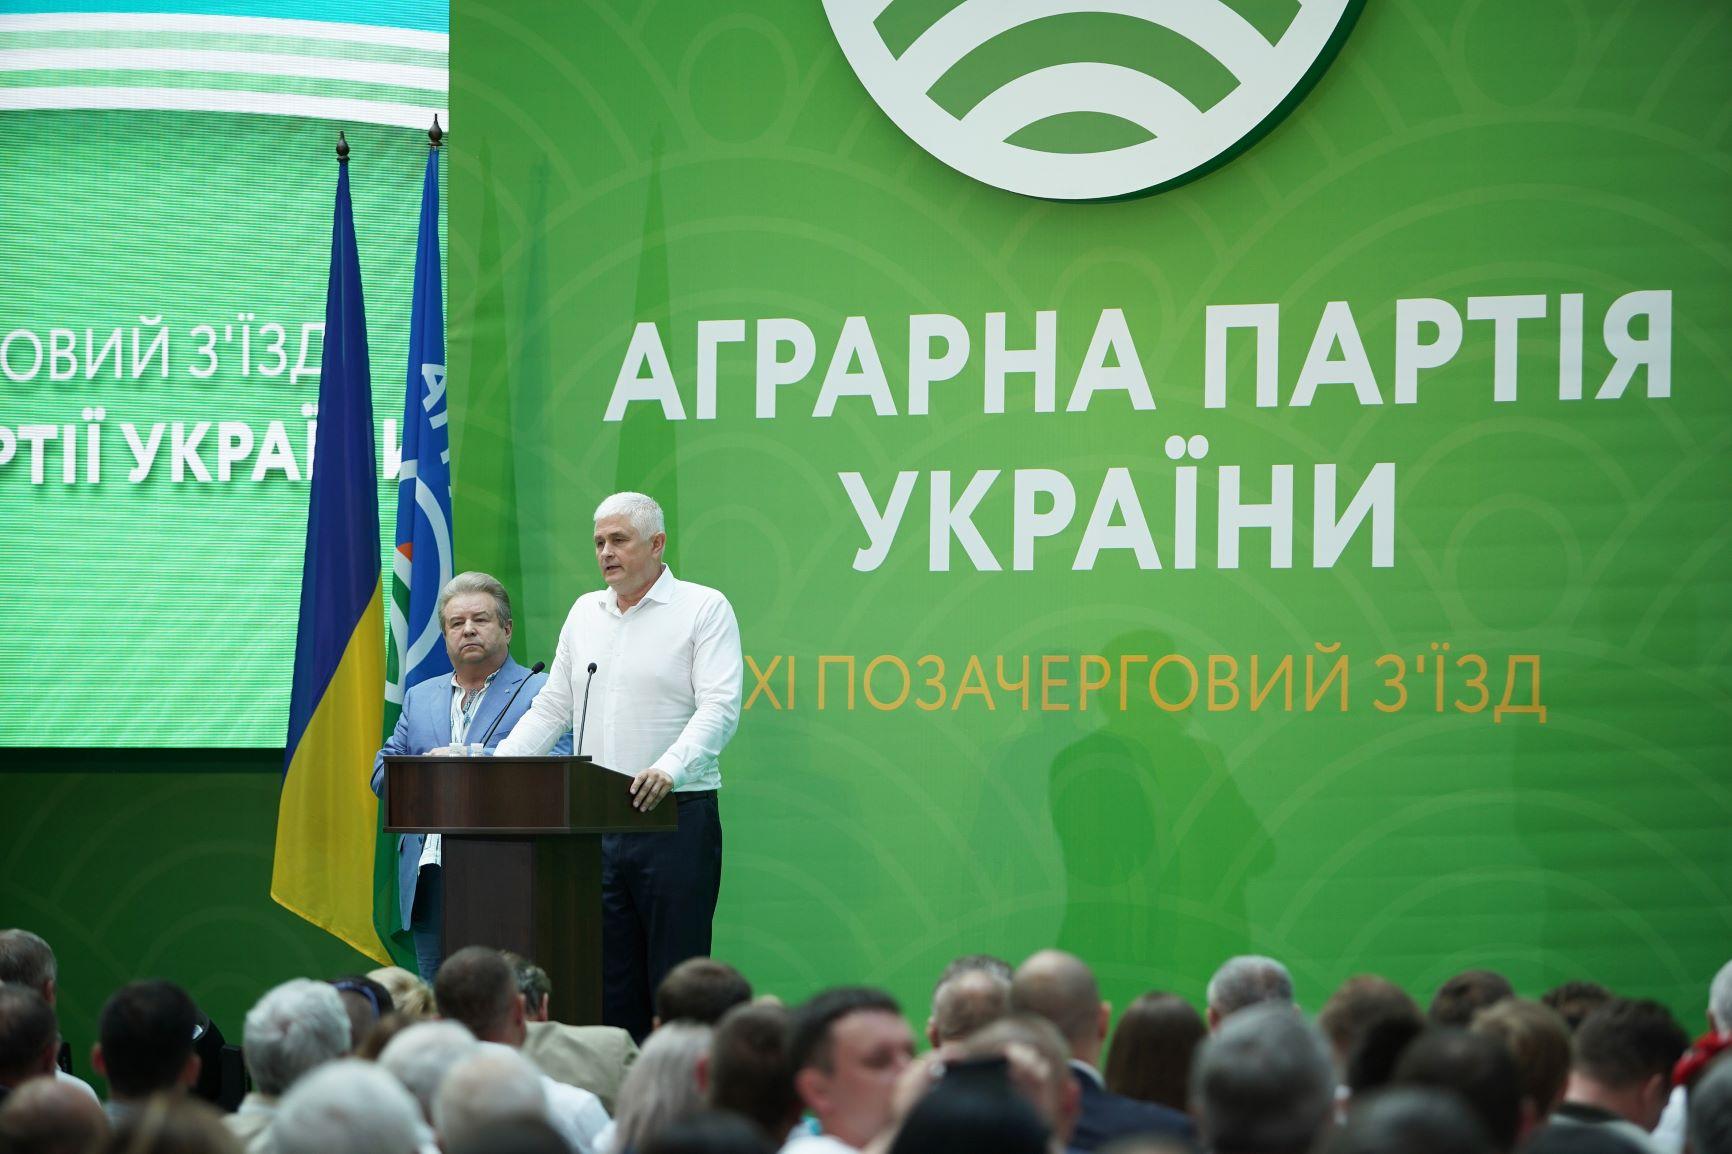 https://agroparty.org.ua/wp-content/uploads/2019/06/GATE_125224_AR_09722-1.jpg